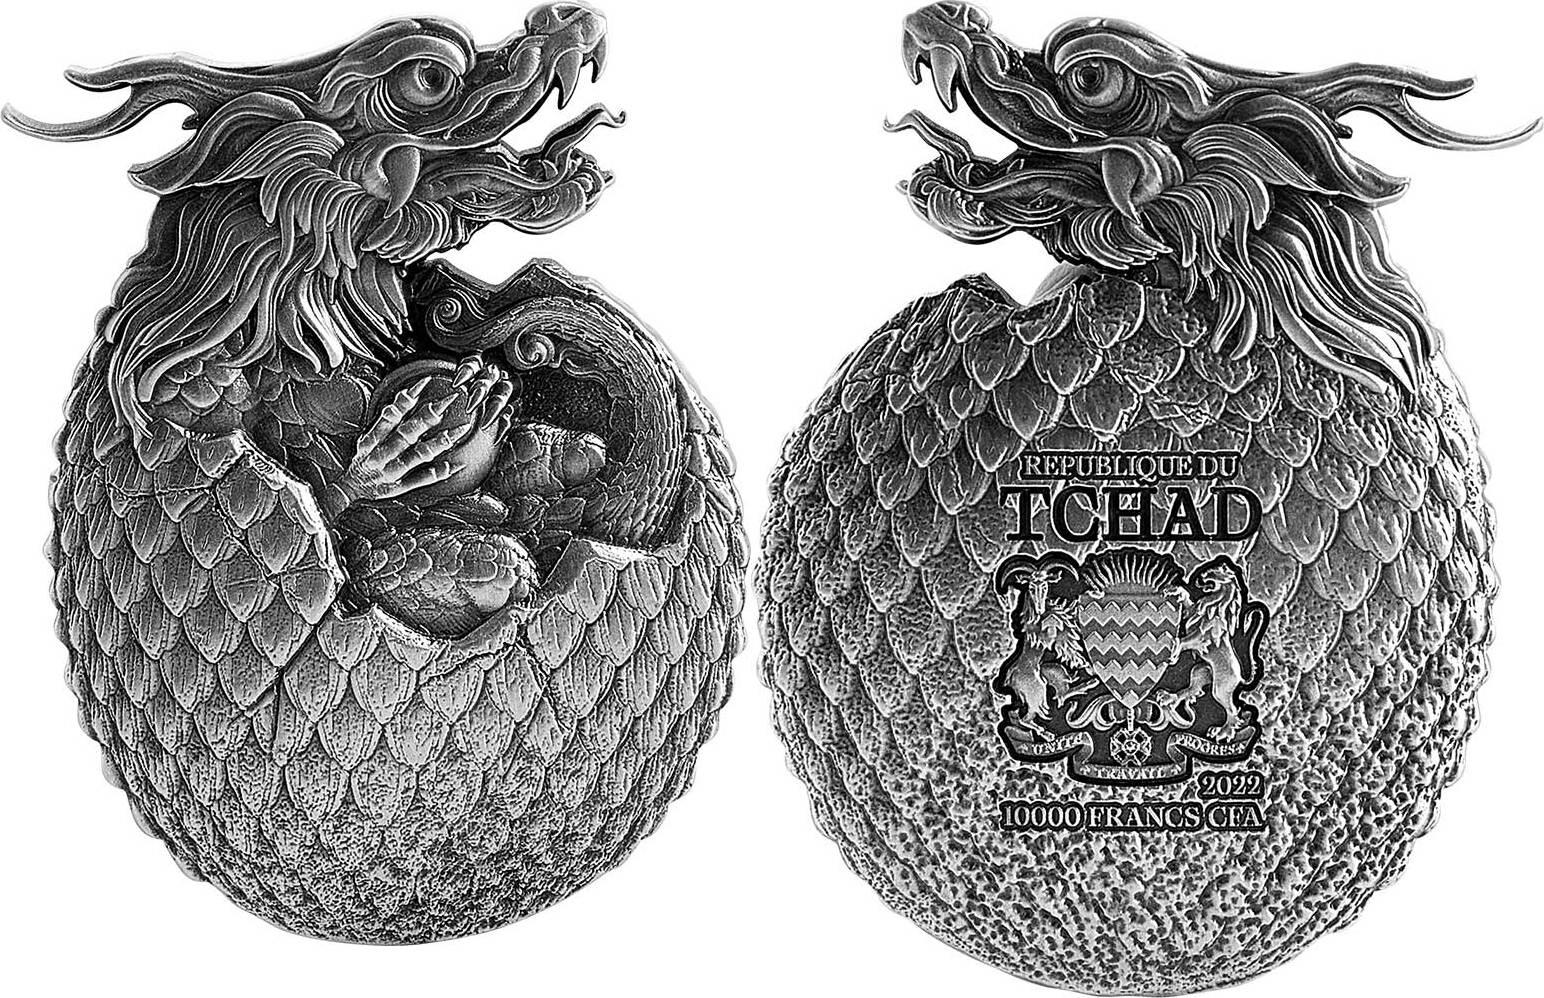 tchad-2022-oeuf-dragon-chinois